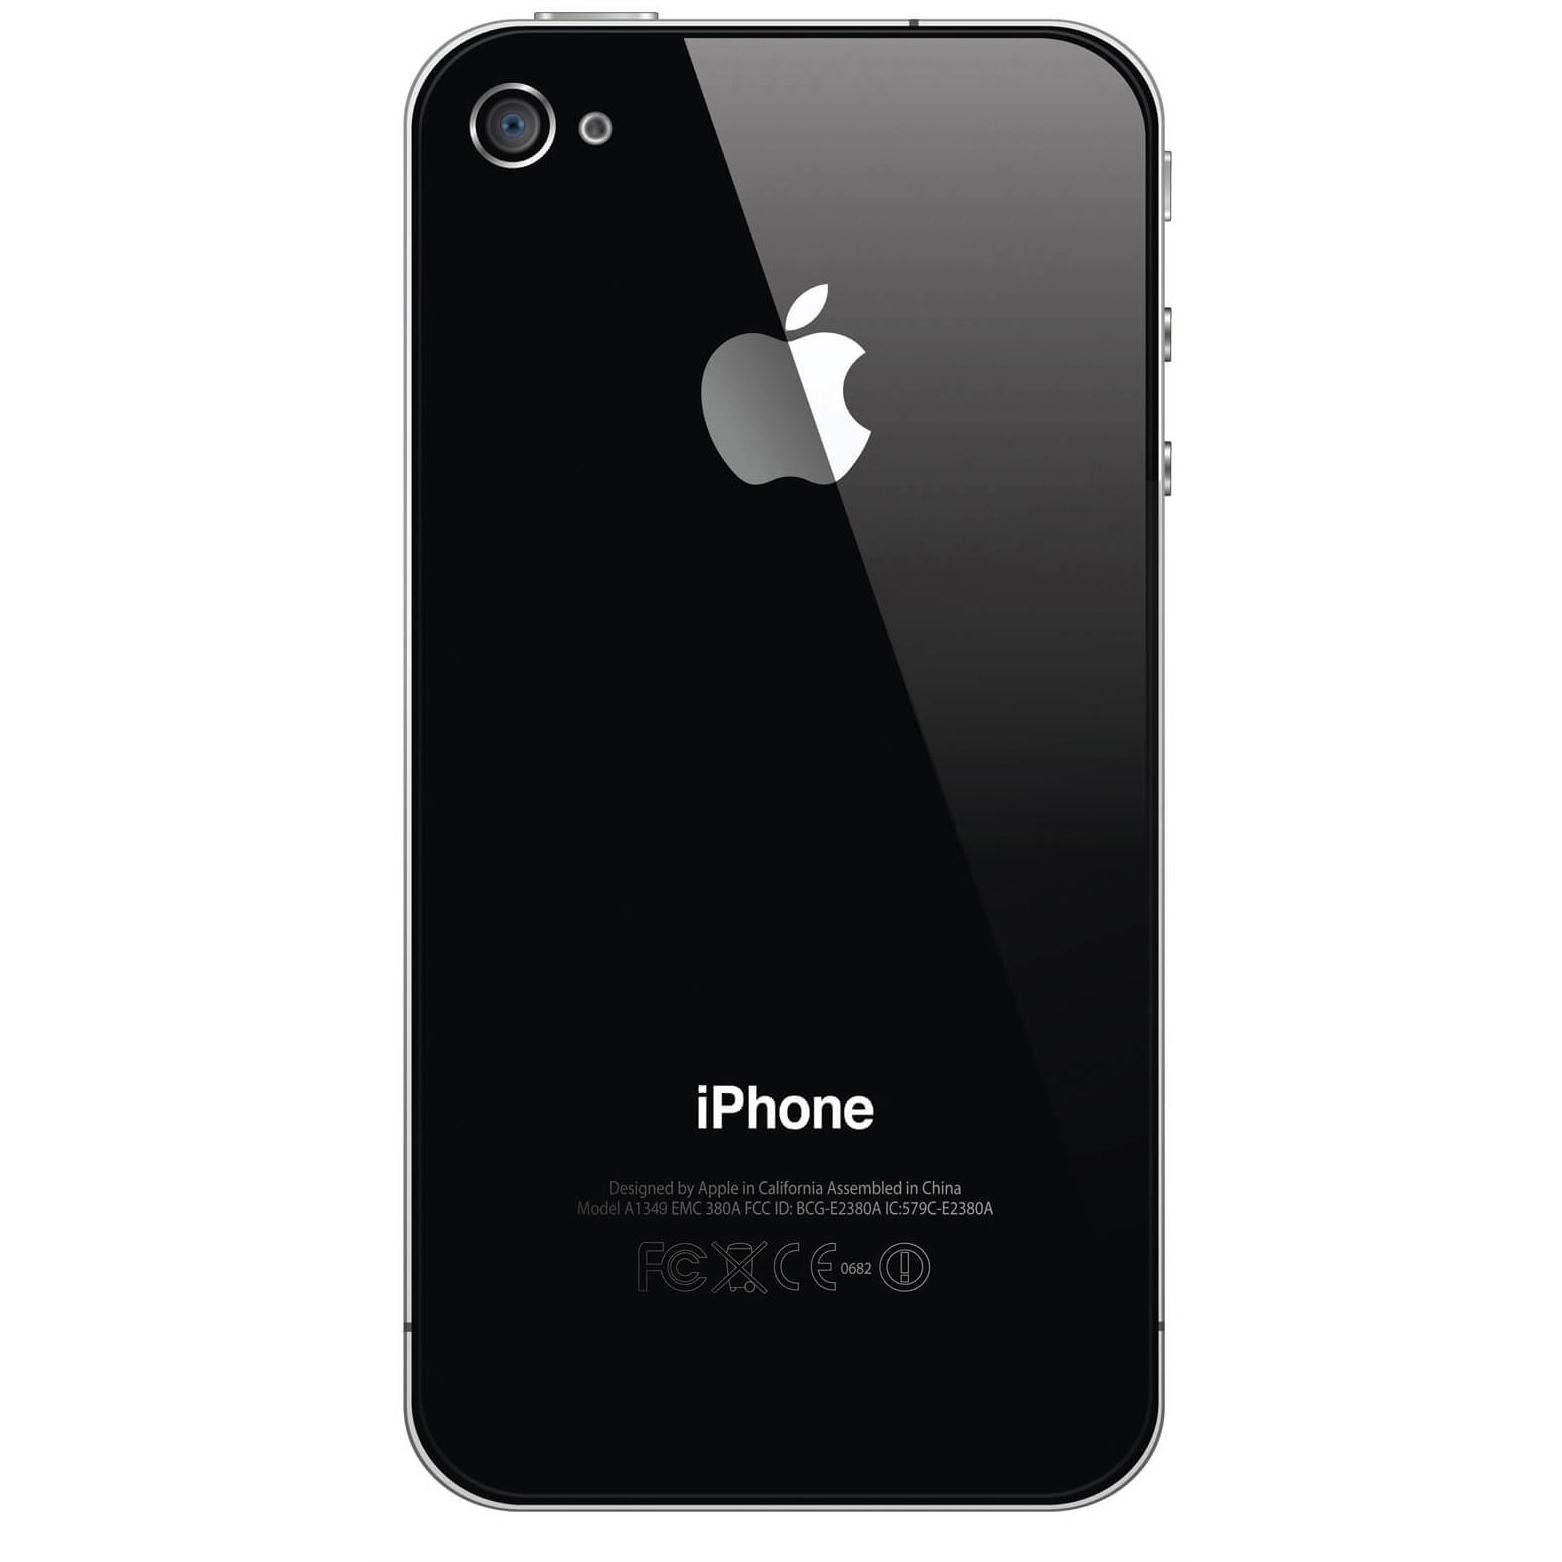 apple iphone 4s 8gb black handys apple iphone 4s. Black Bedroom Furniture Sets. Home Design Ideas